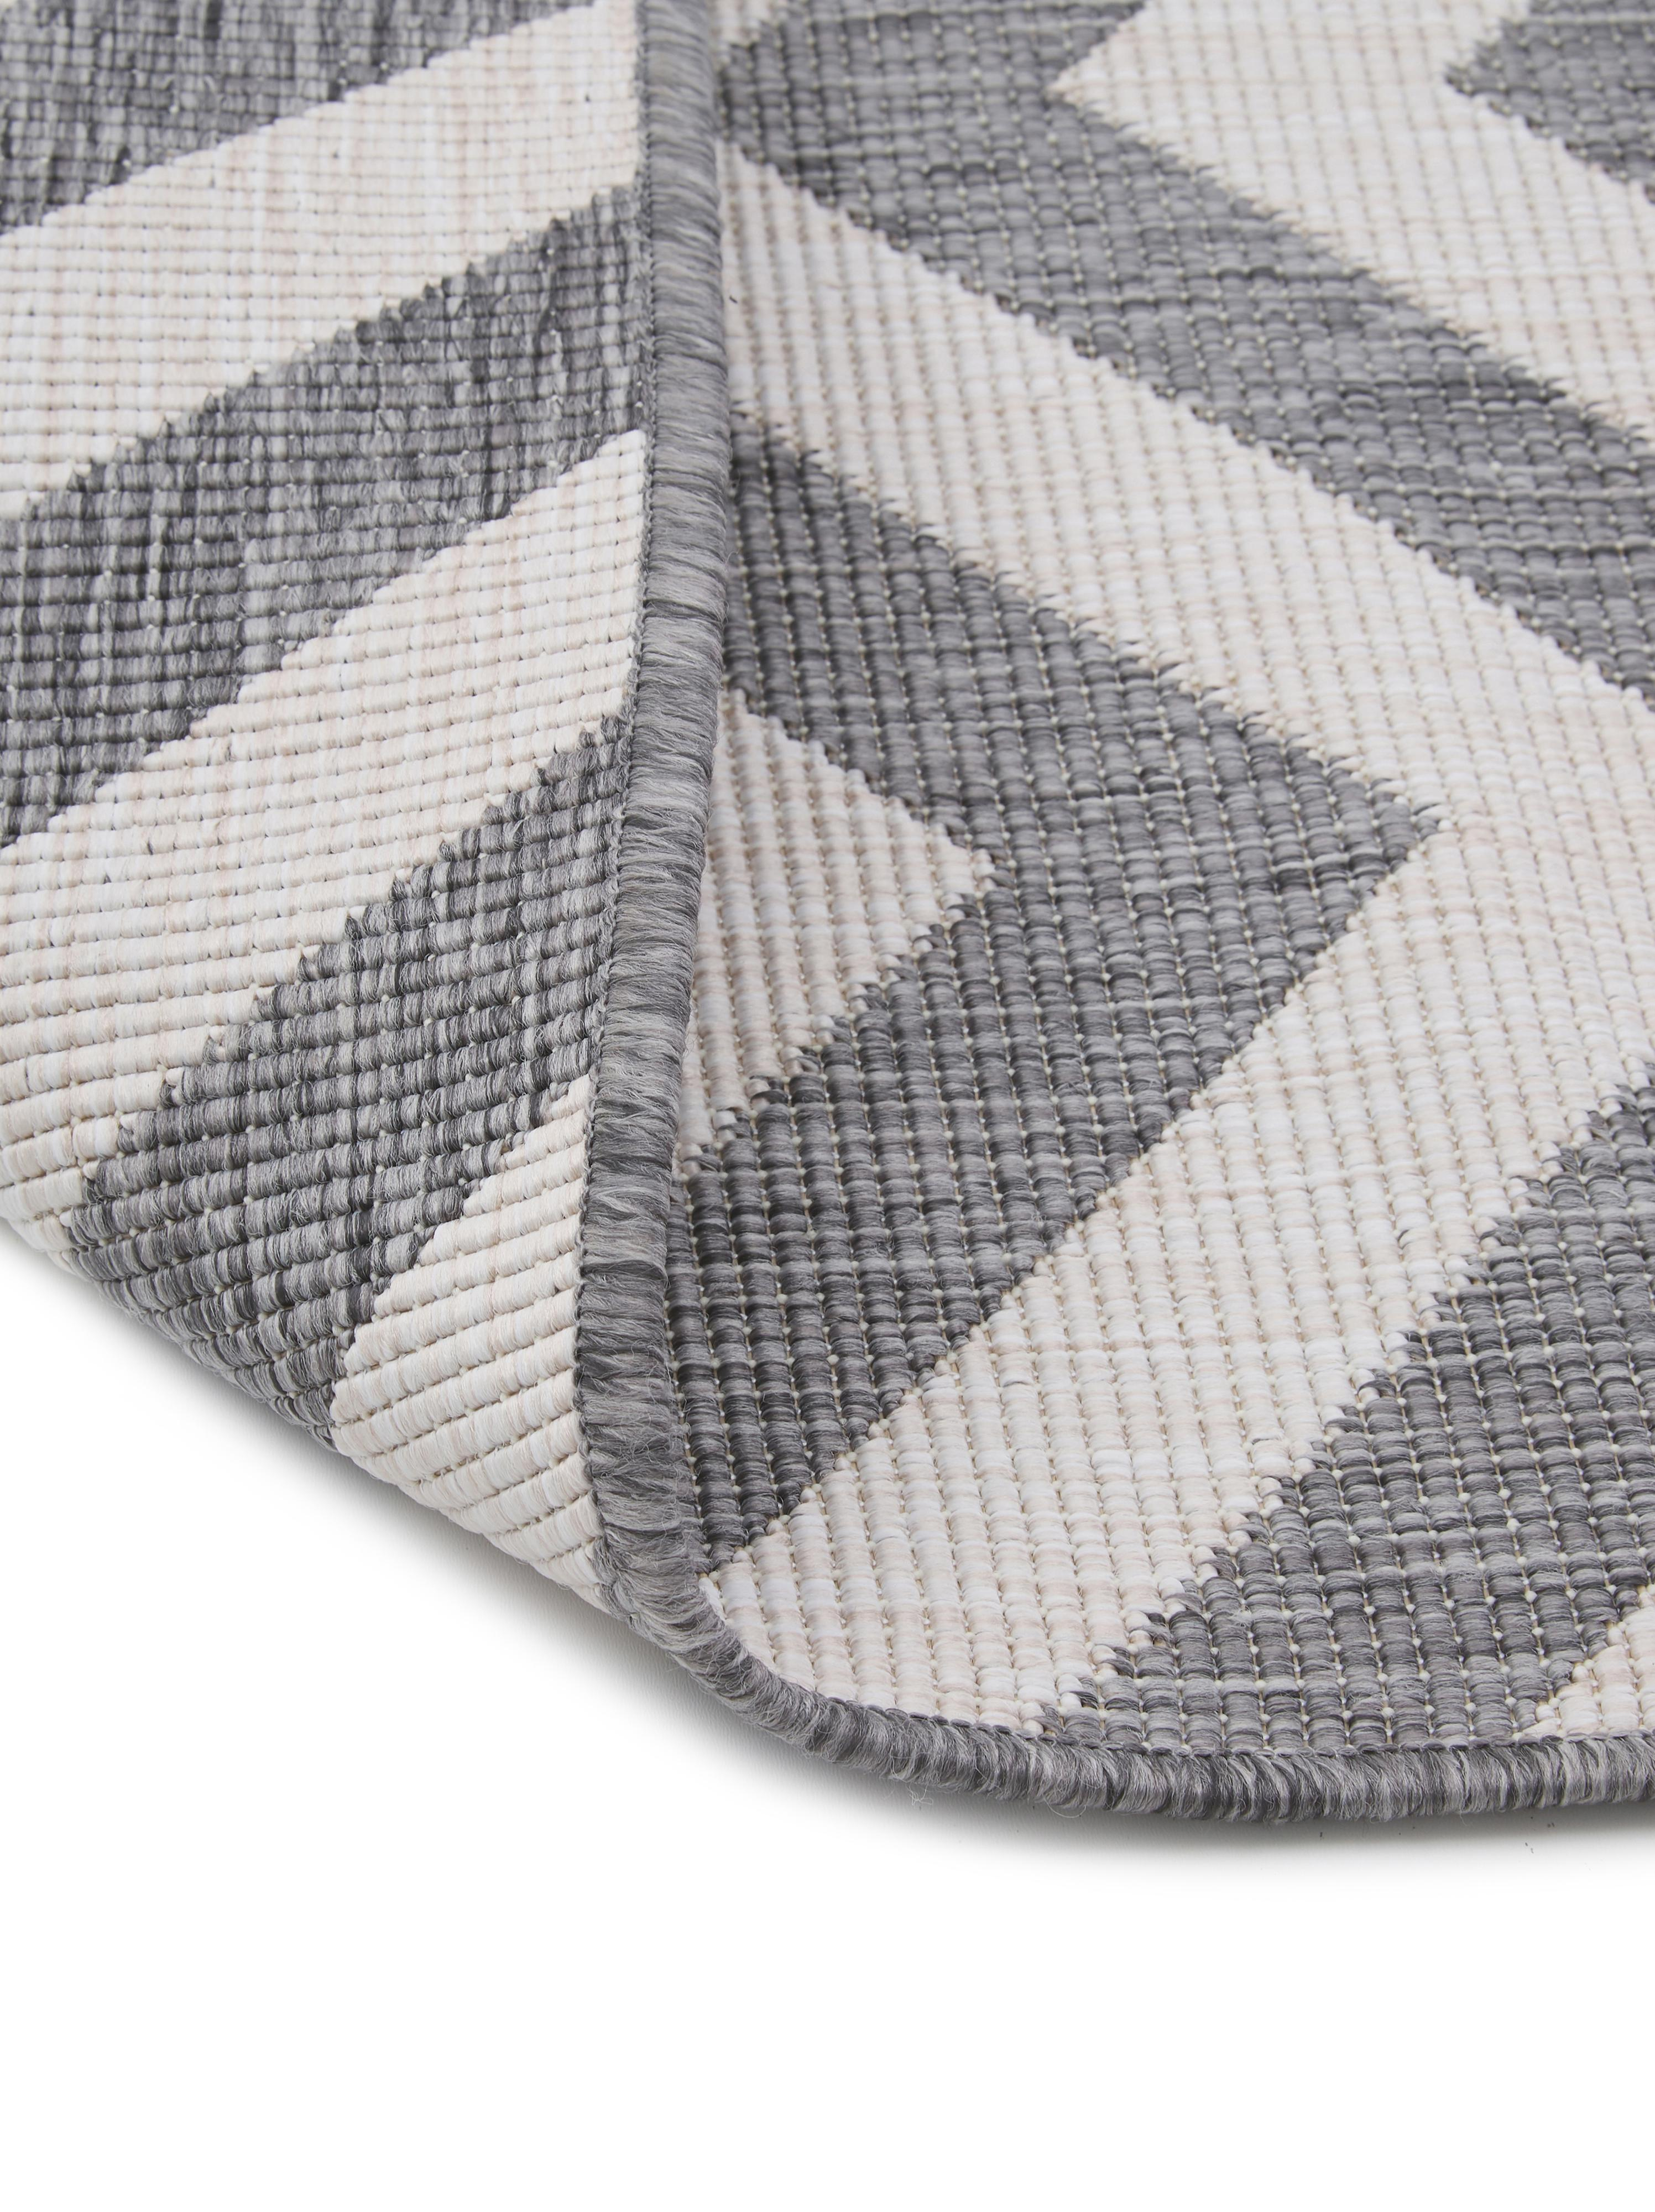 Alfombra reversible de interior/exterior Palma, Gris, crema, An 200 x L 290 cm (Tamaño L)